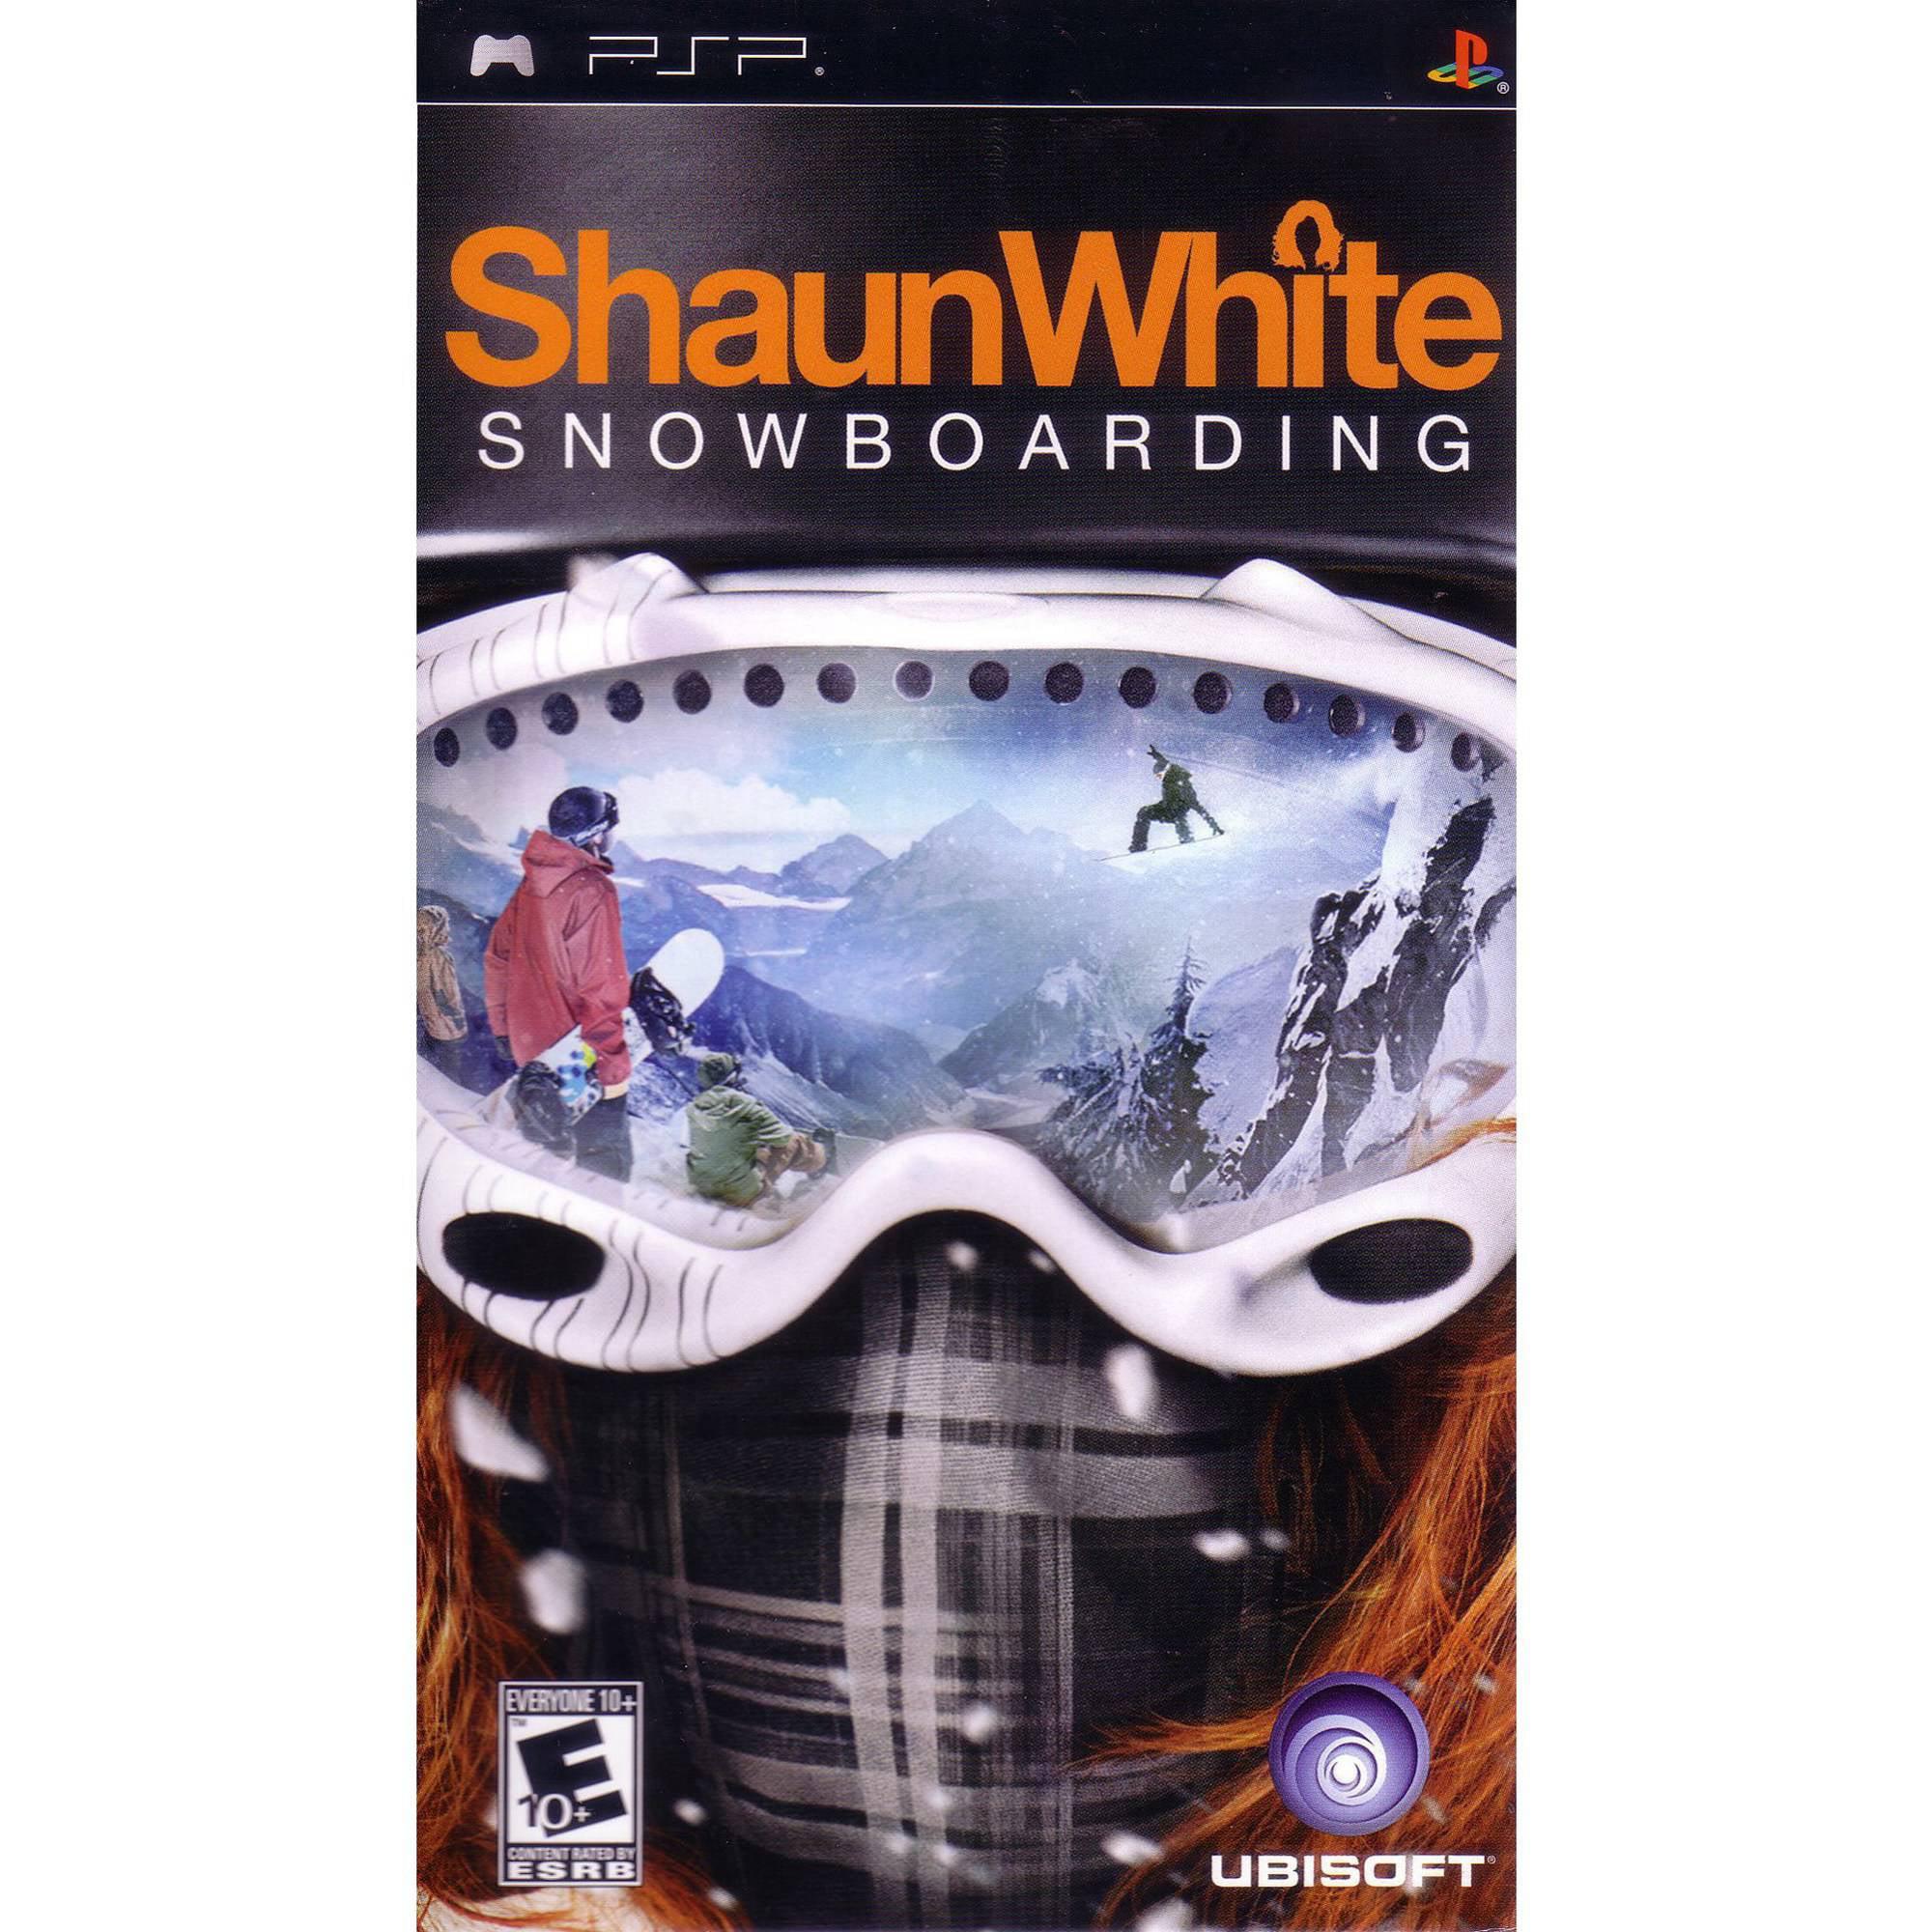 Shaun White Snowboarding (PSP) - Pre-Owned